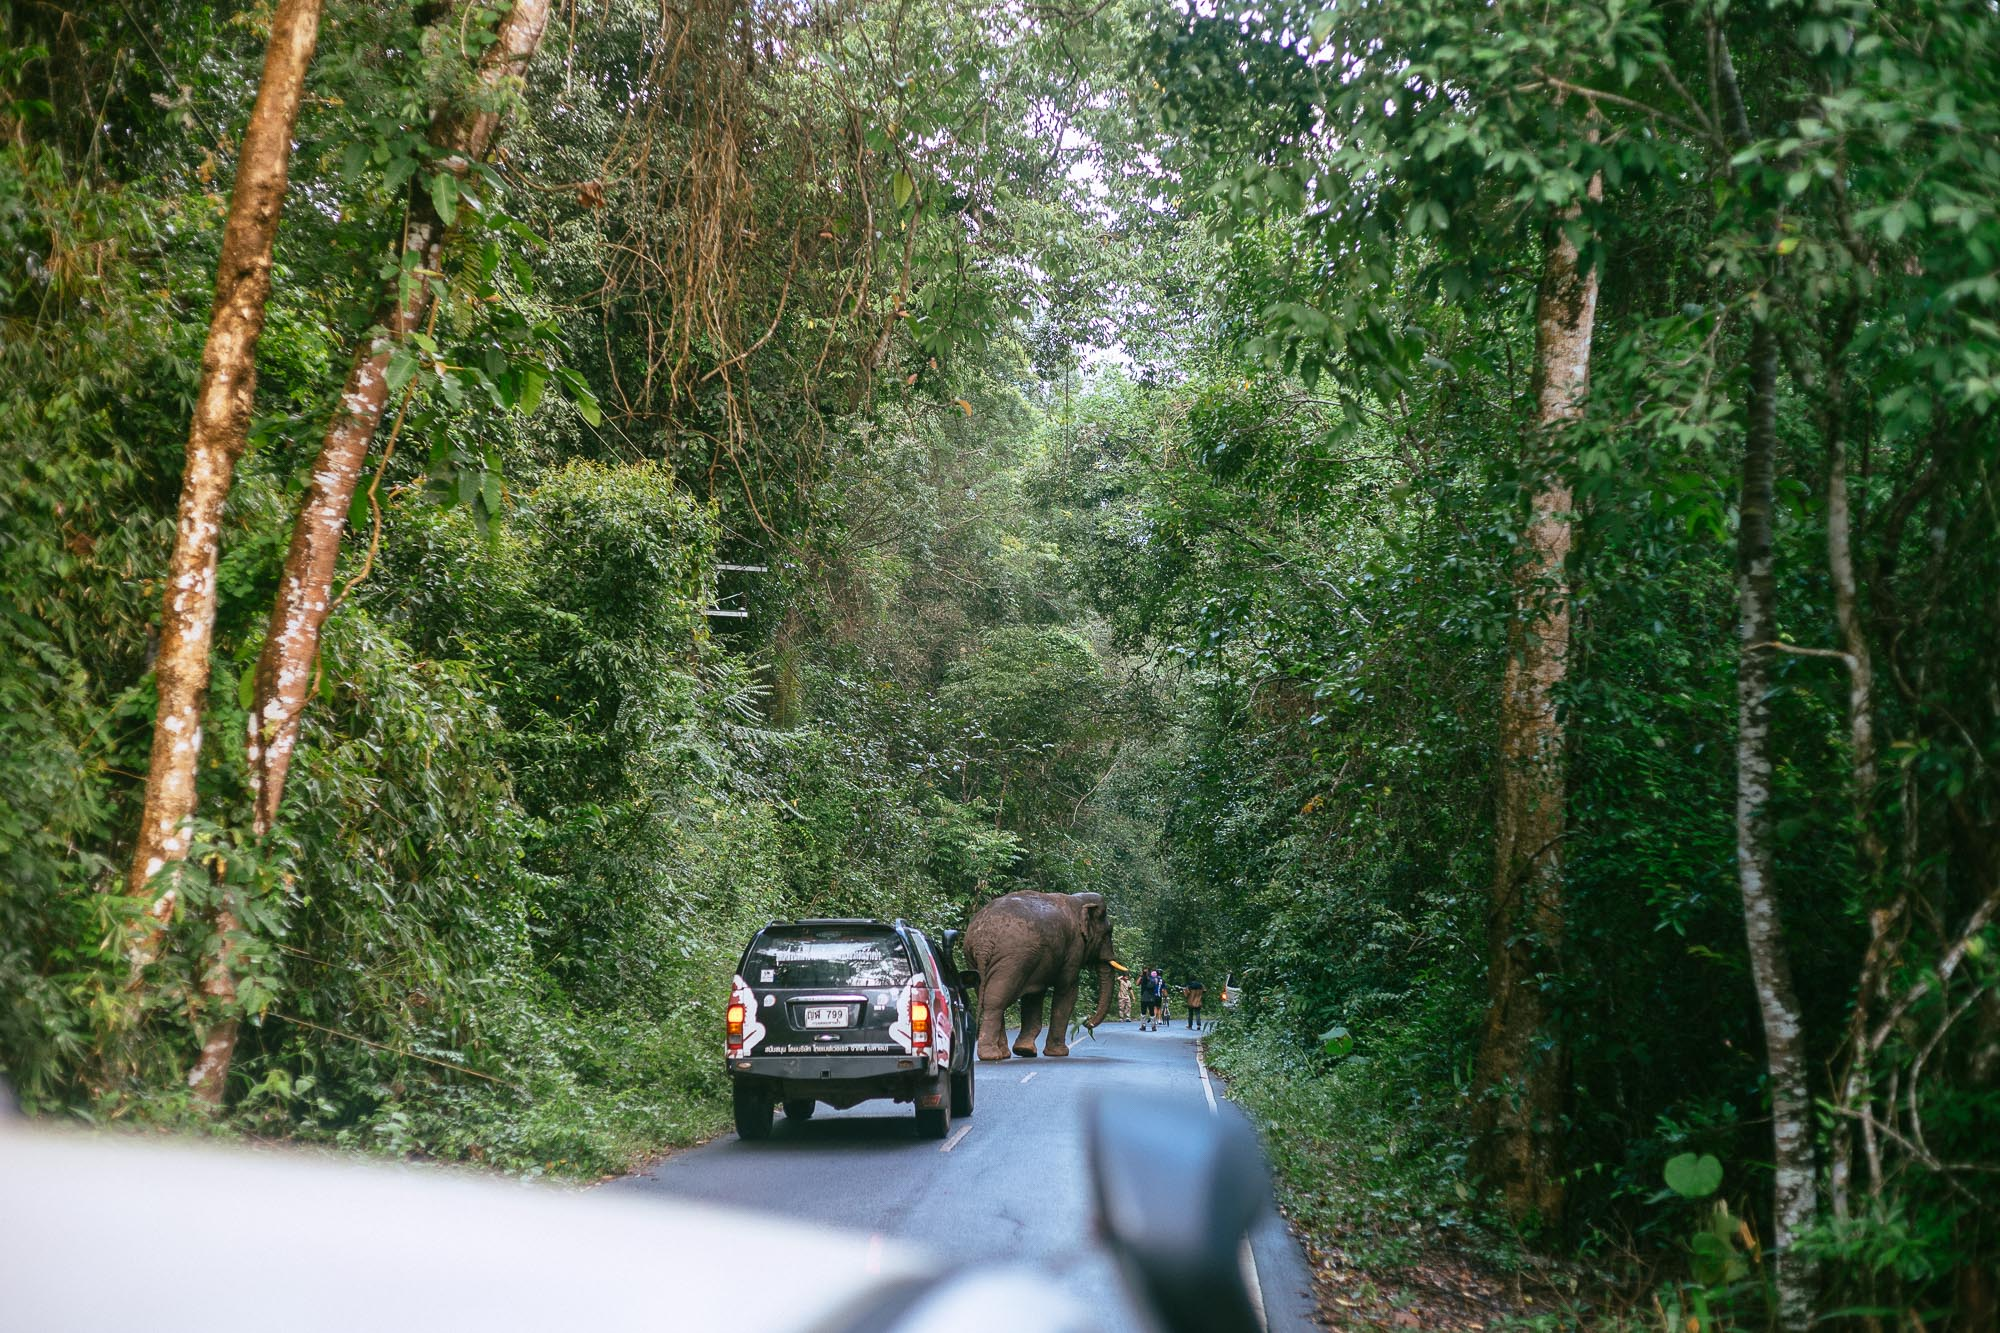 Elephant Crossing, Khao Yai